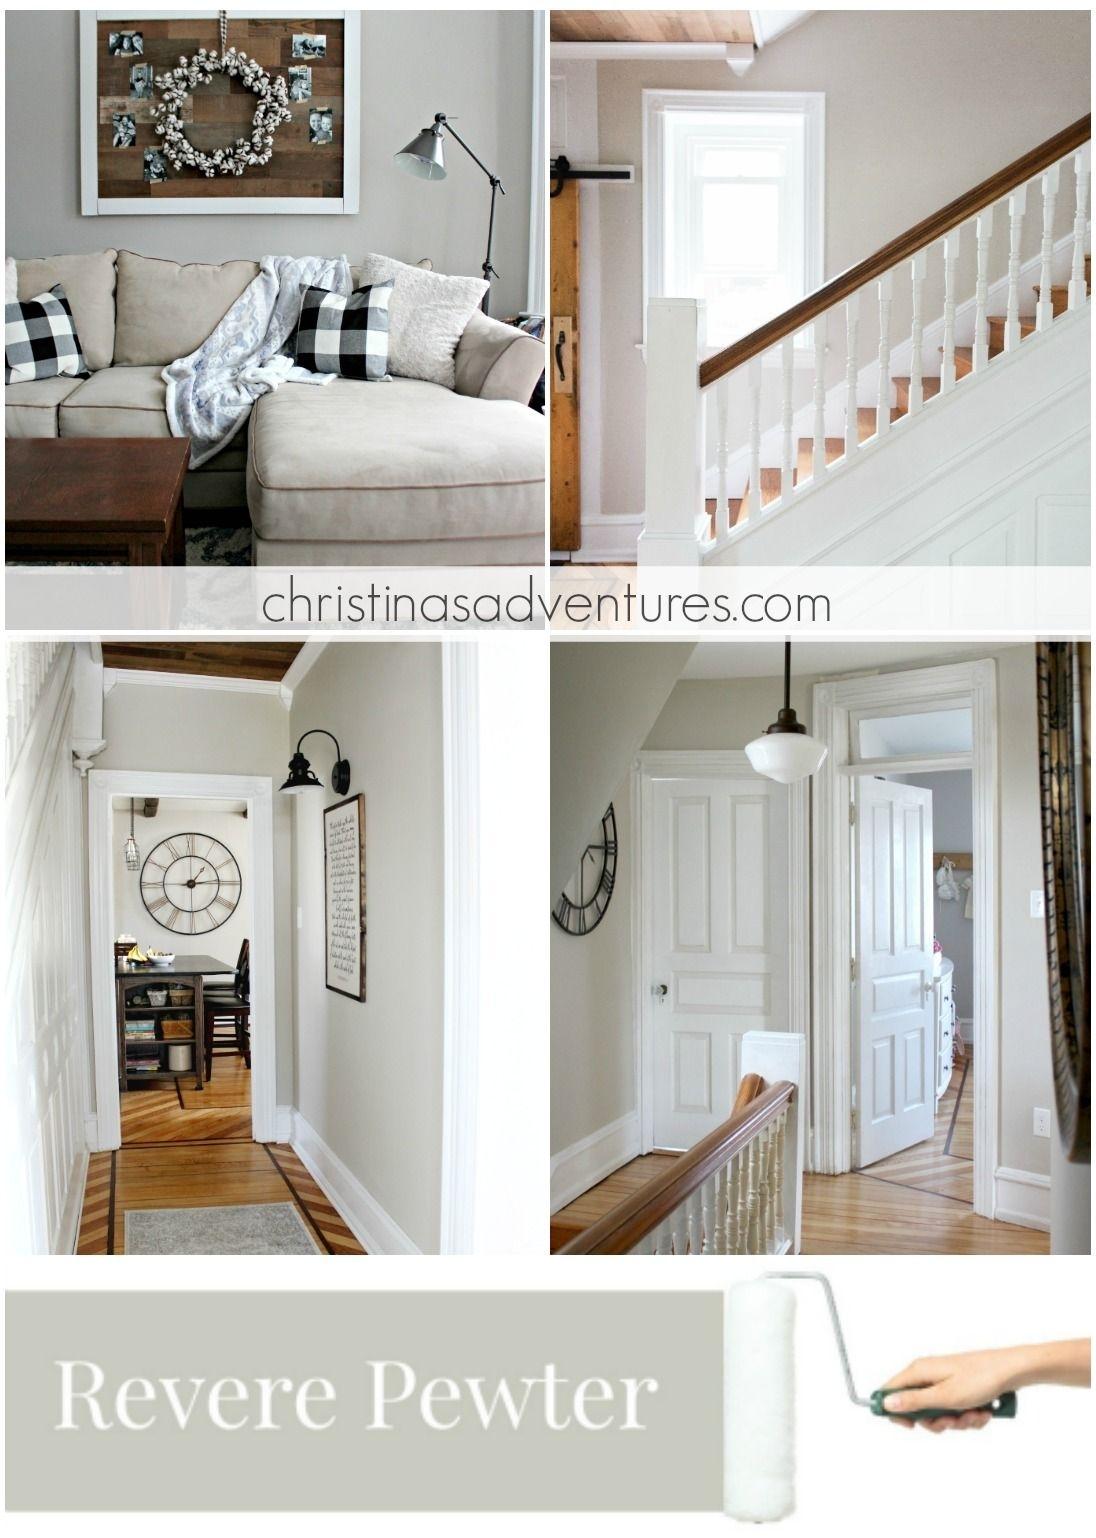 Our House: Modern Farmhouse Paint Colors | Farmhouse Paint Colors regarding Recent Wall Accents For Revere Pewter